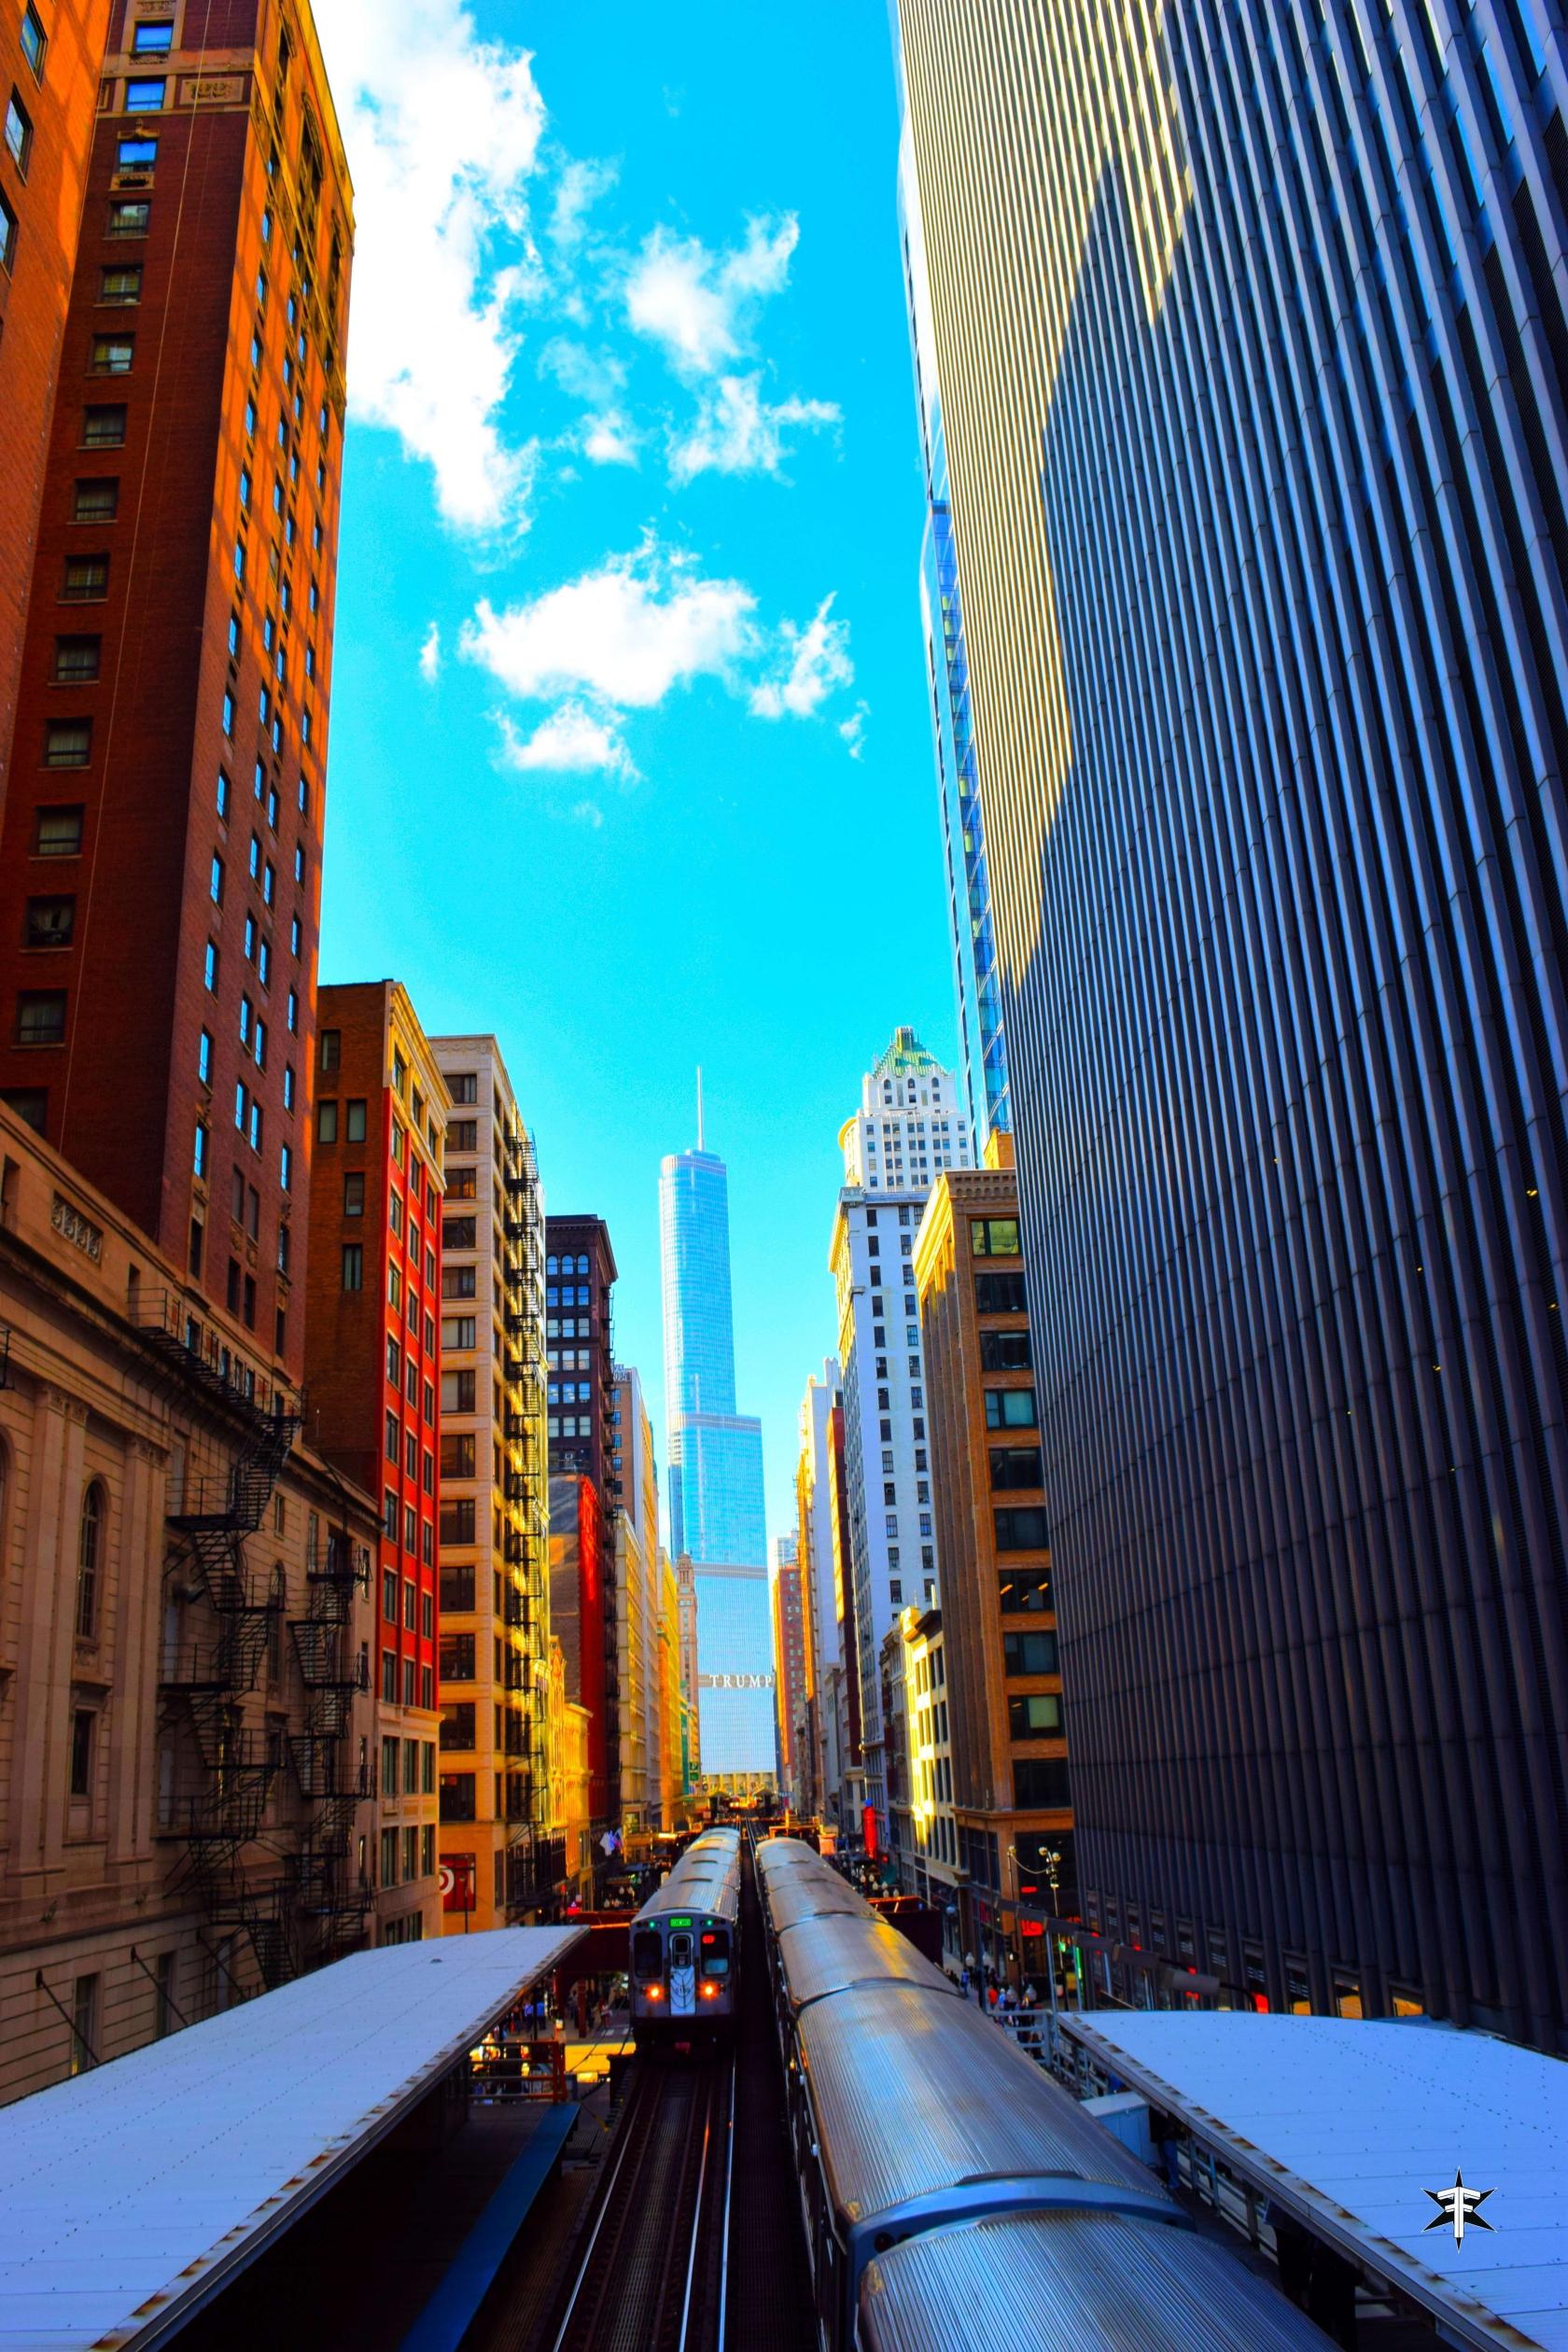 batch_cta chicago trump tower train contrast architecture.jpg